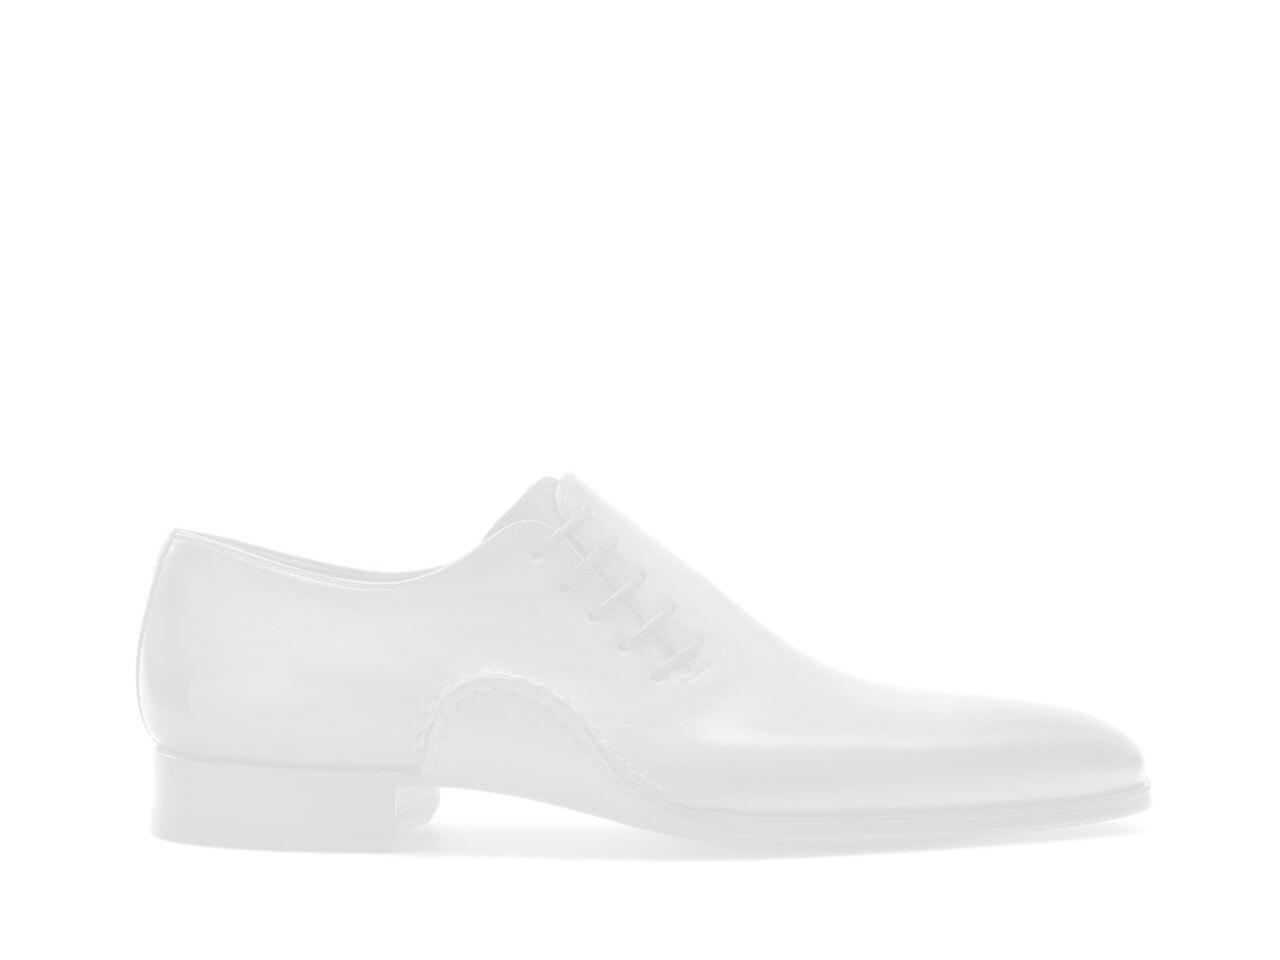 Sole of the Magnanni Echo Lo II Black Men's Sneakers